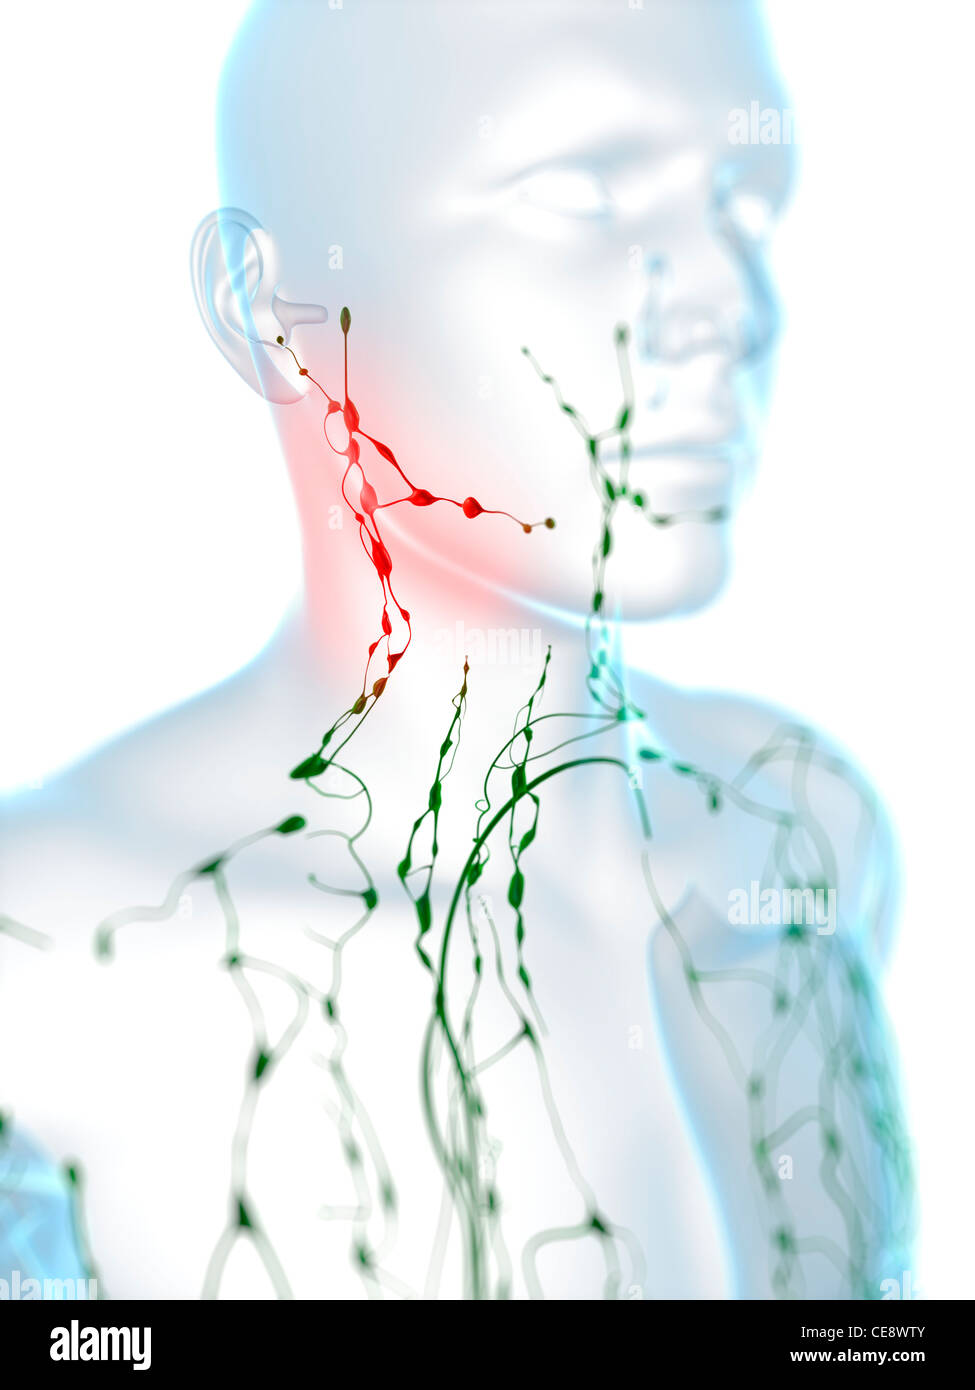 Swollen Lymph Nodes In The Neck Computer Artwork Stock Photo